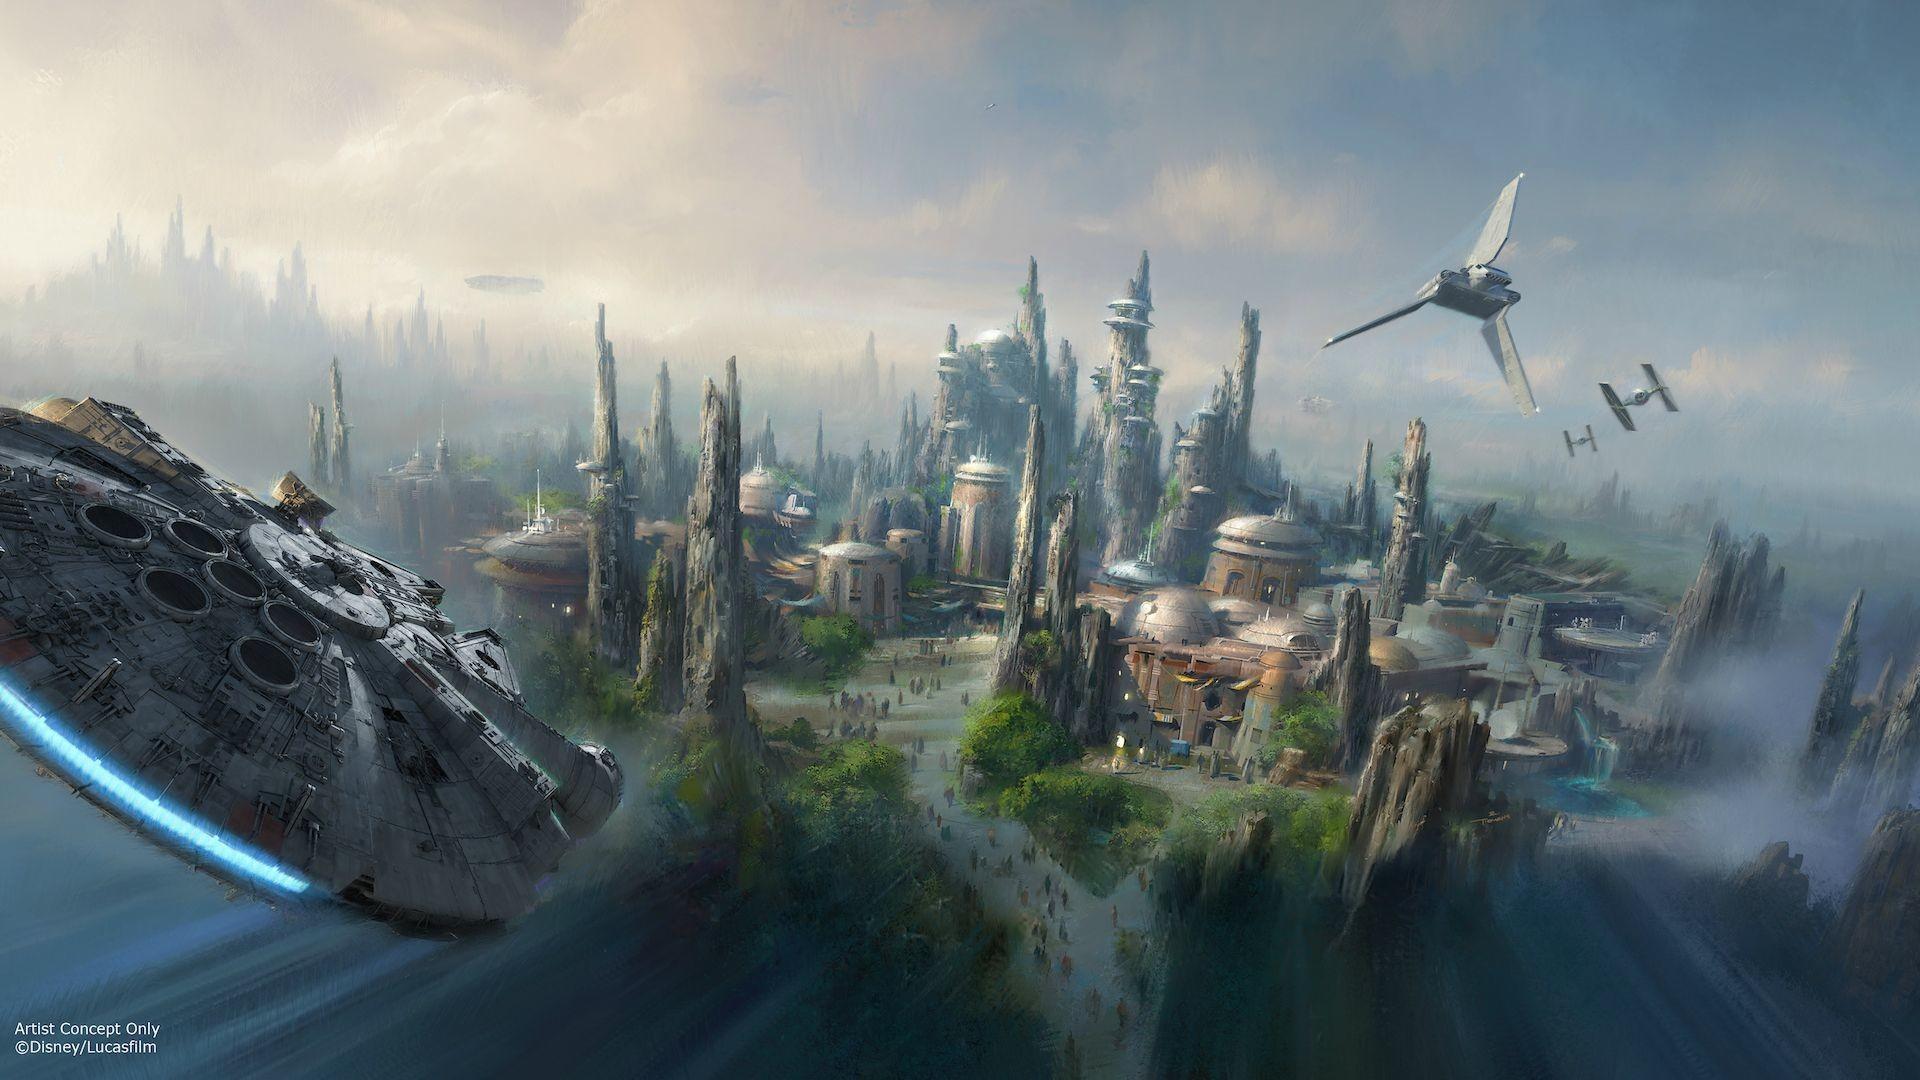 Disney's Star Wars Theme Park Concept Art